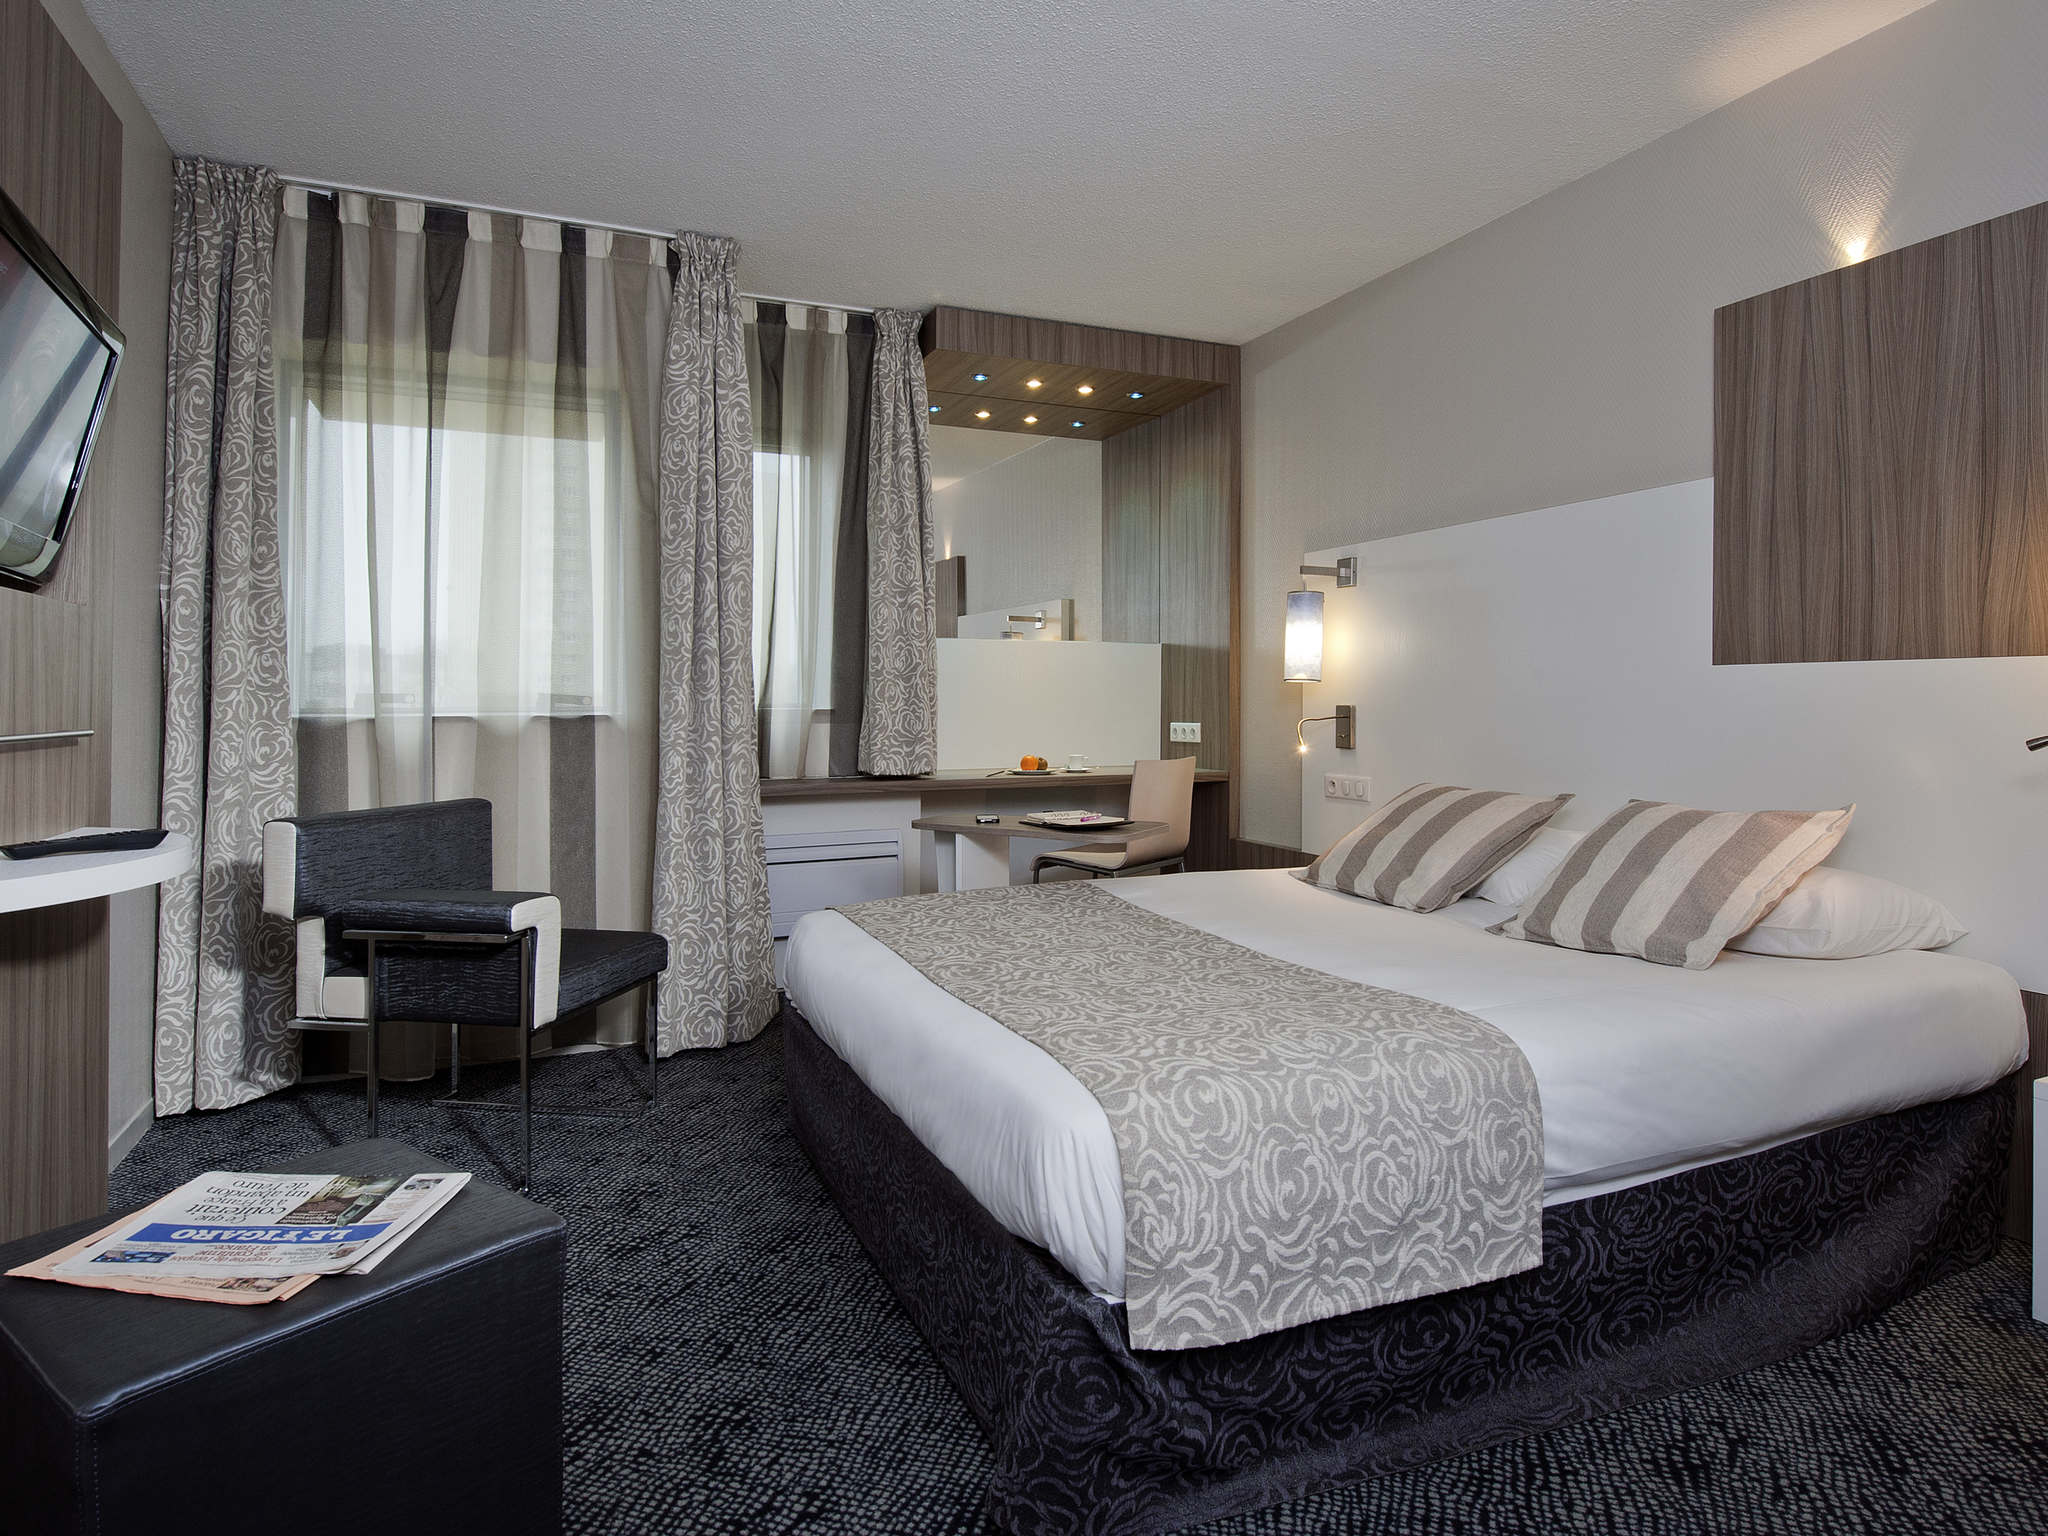 Hotel Mercure Paris Sud Parc Du Coudray Hotel In Rubelles Ibis Styles Melun